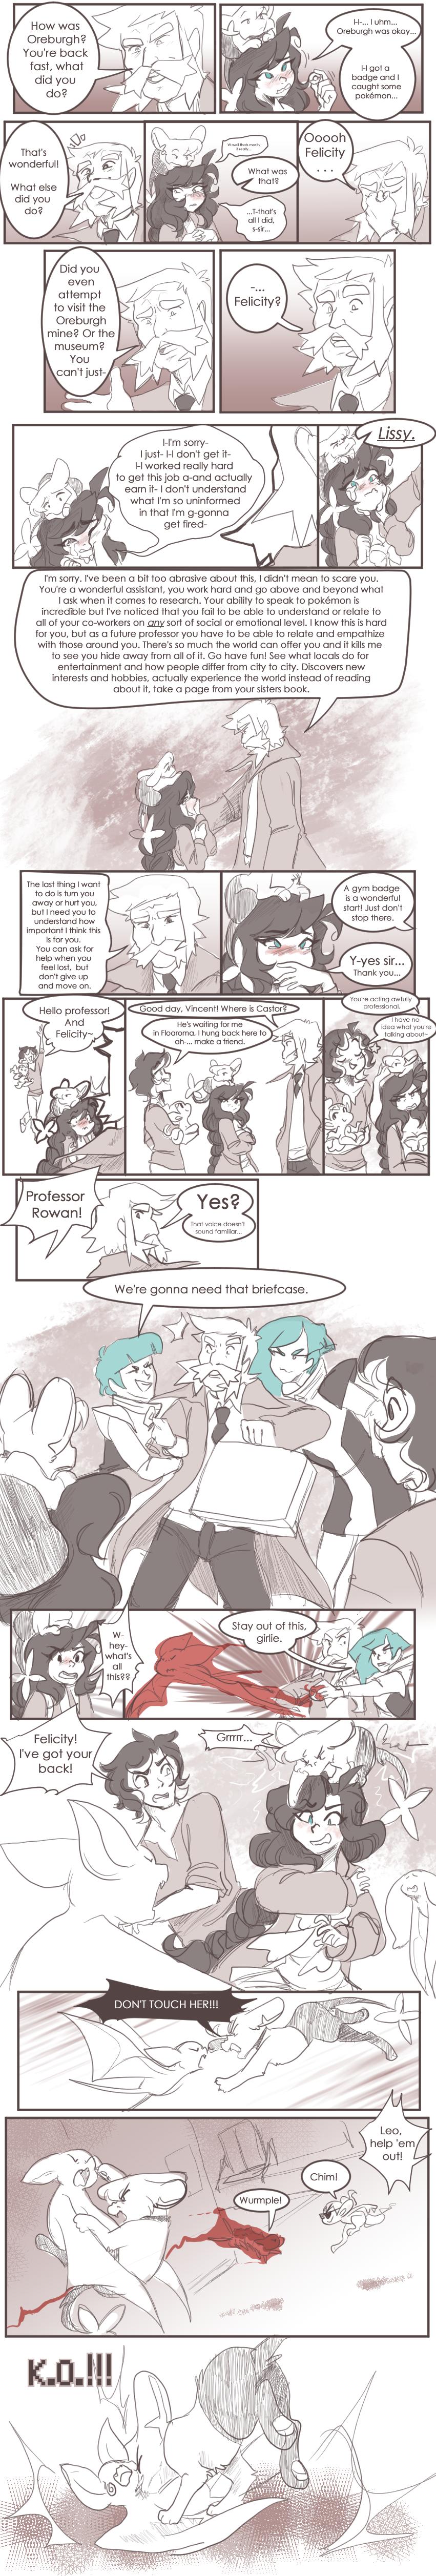 Lissylocke Page 9 By Skitea On Deviantart